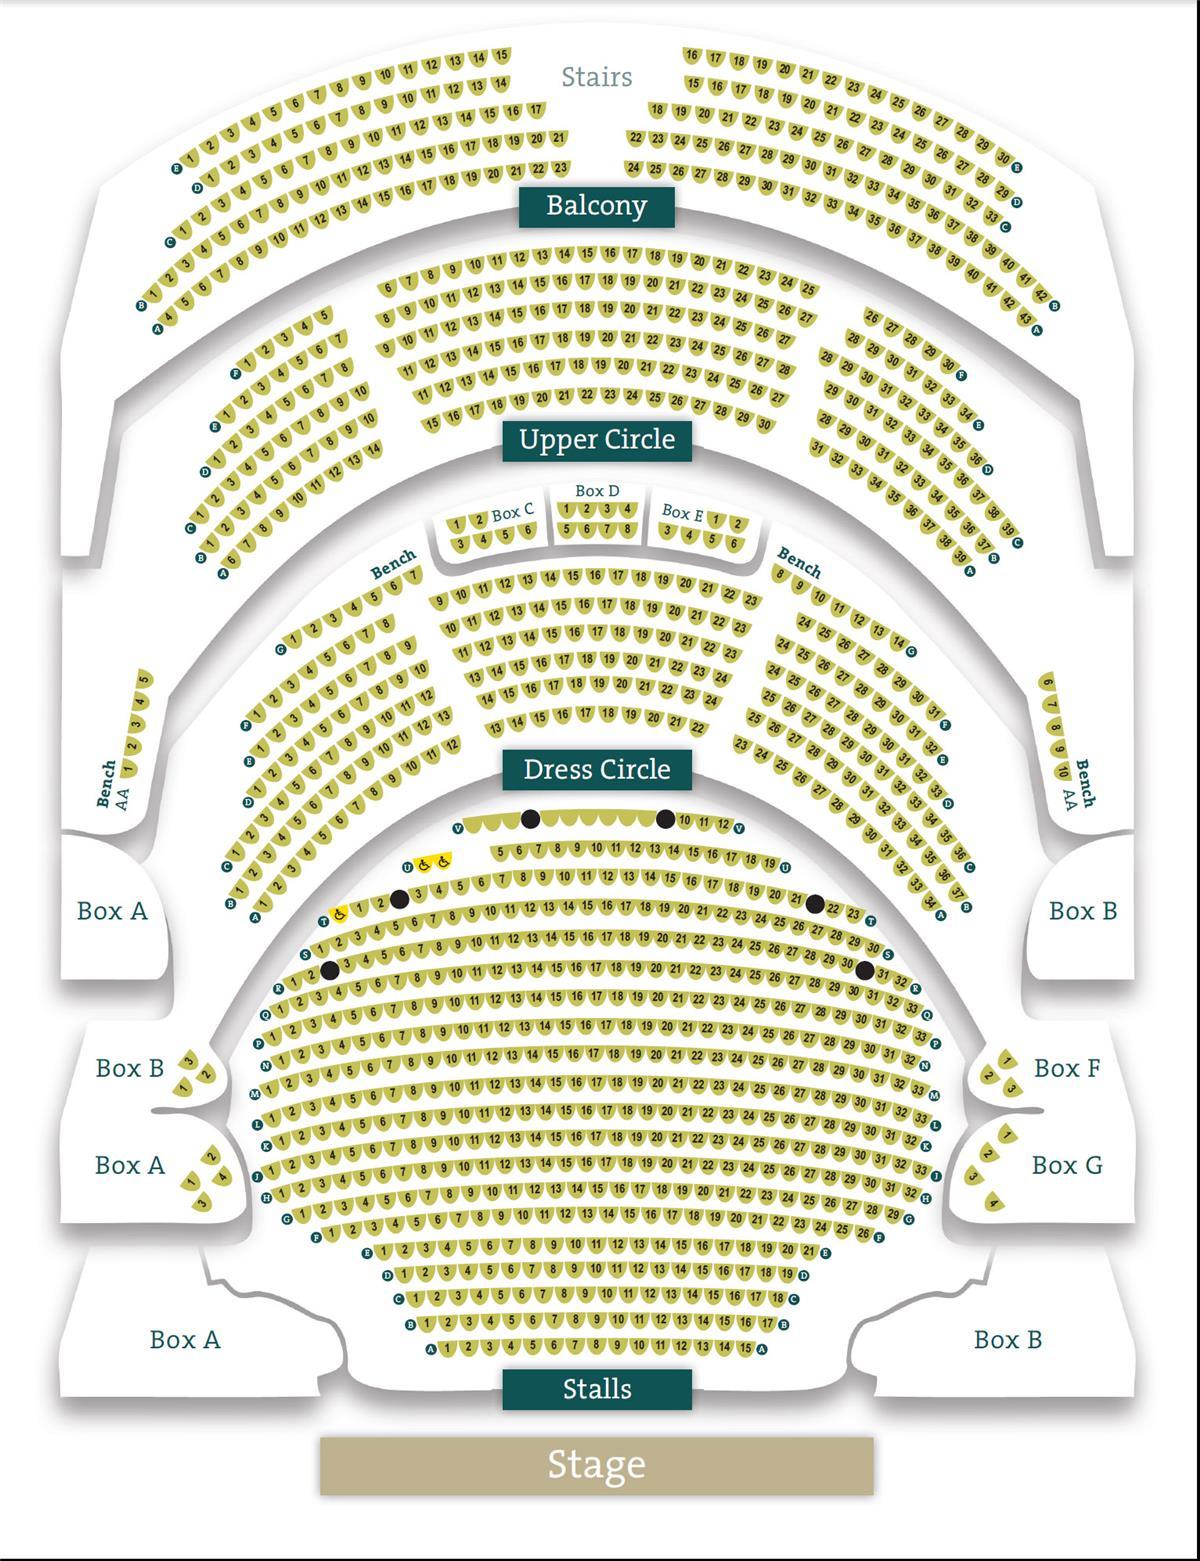 Theatre Royal Nottingham Seat Plan For Shrek The Musical